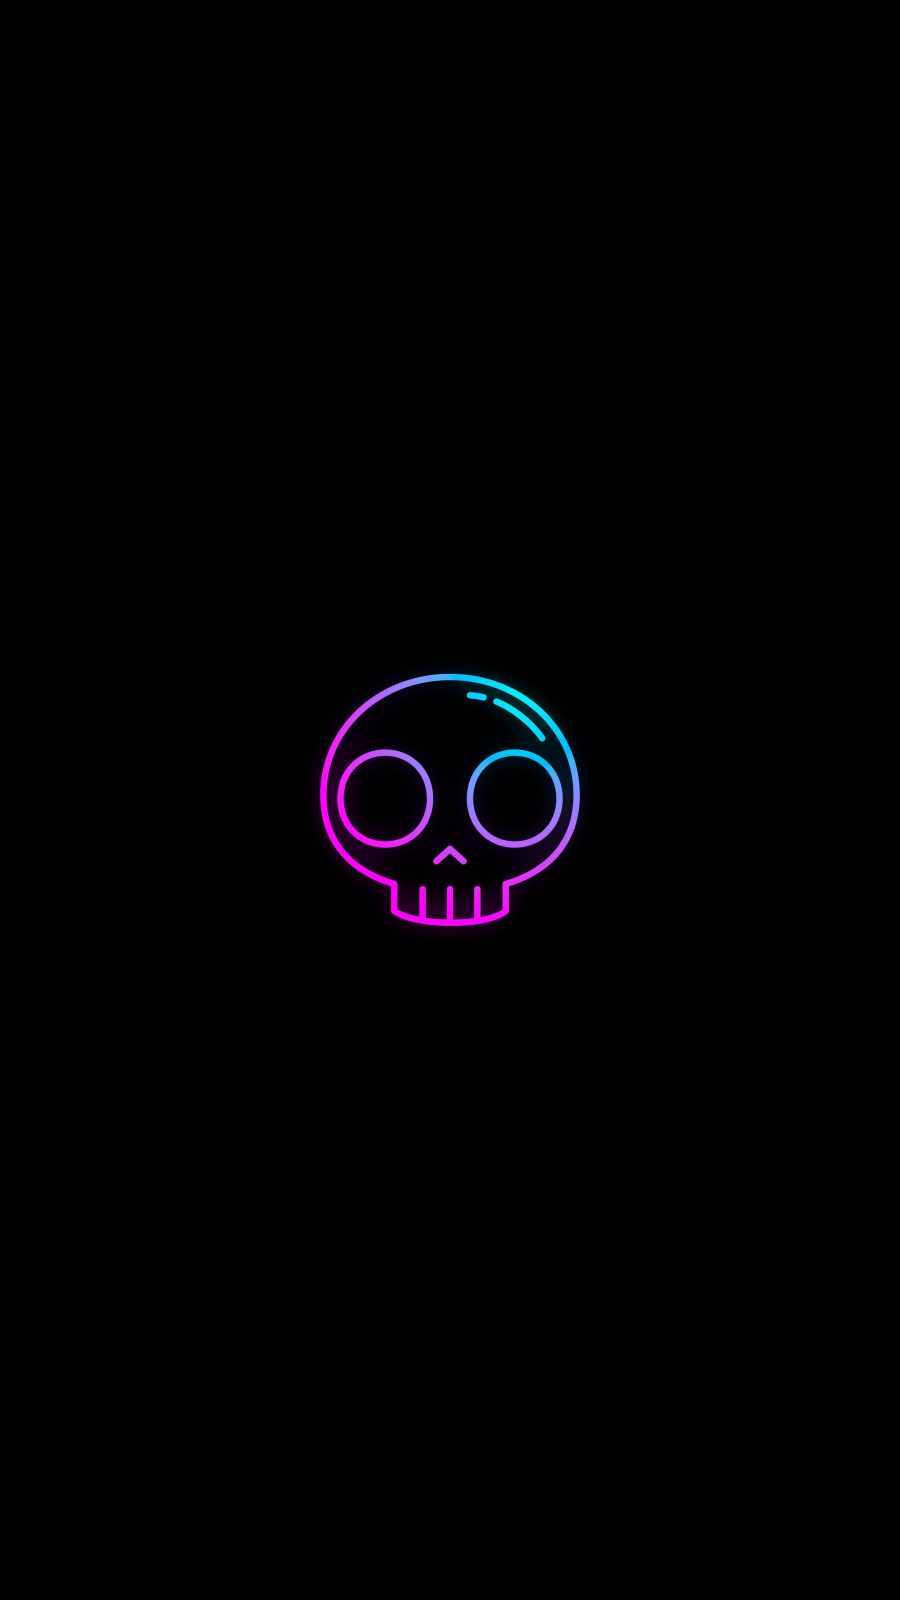 Amoled Skull iPhone Wallpaper